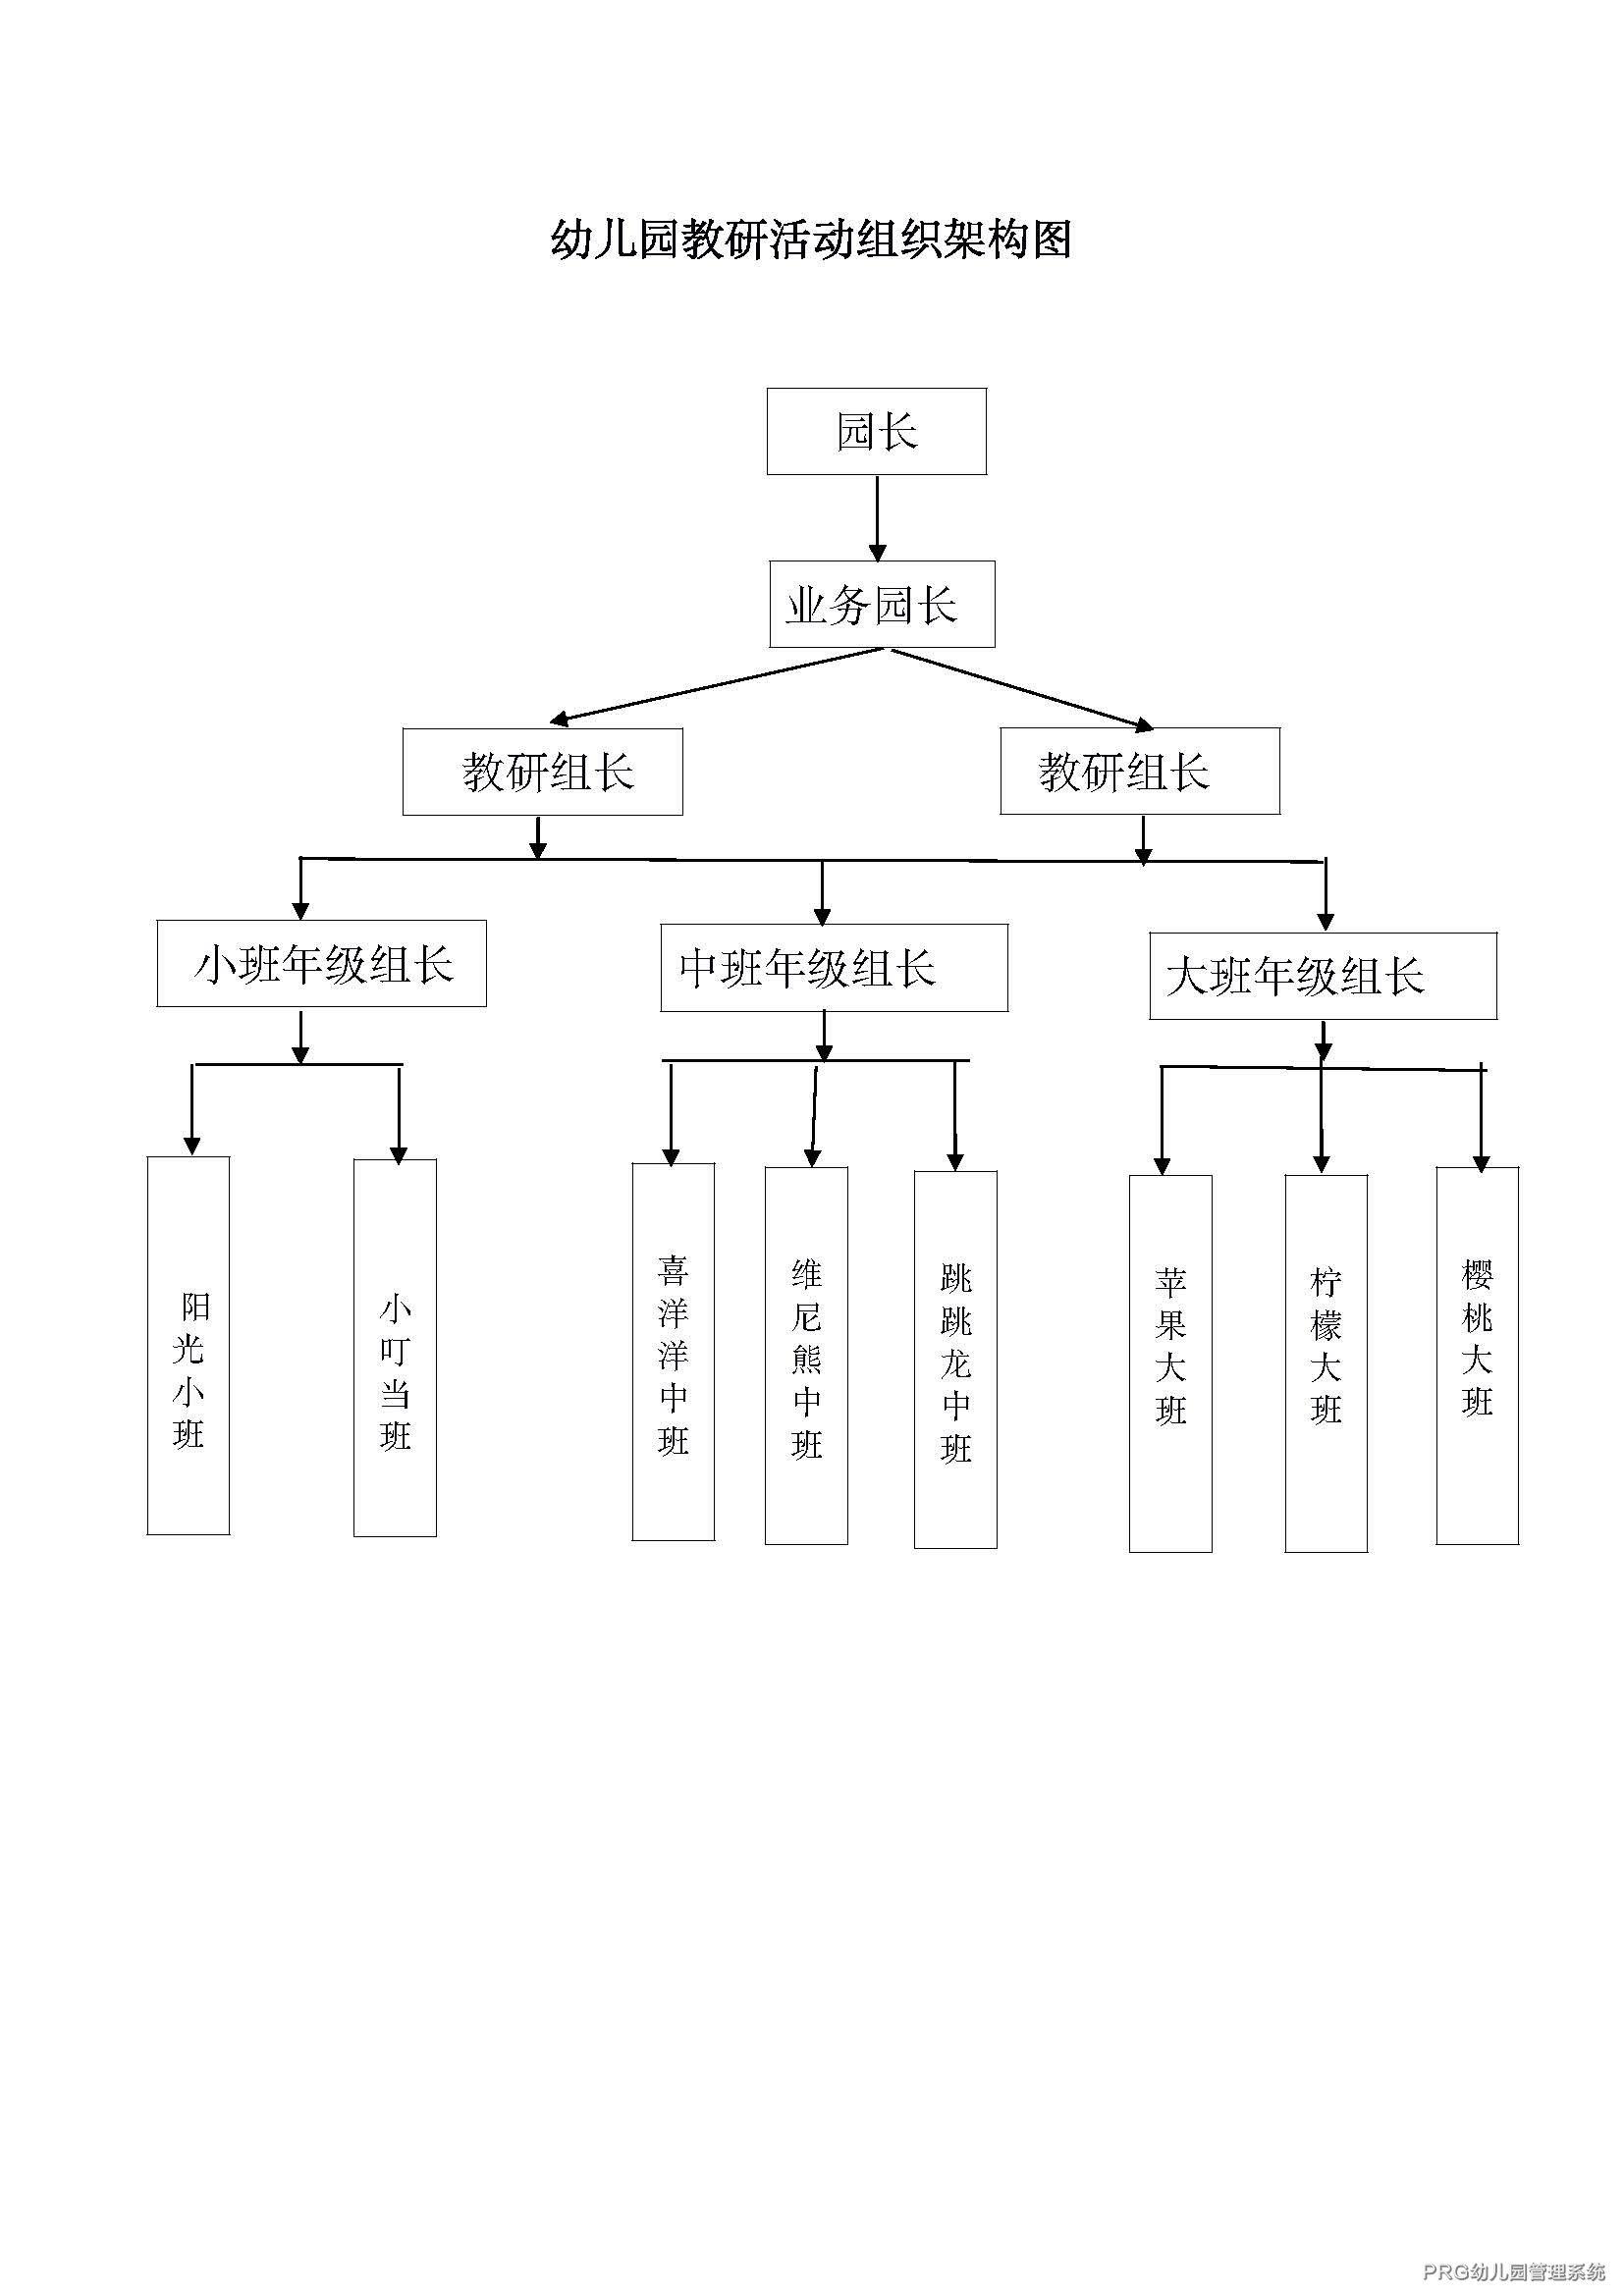 <a href=https://www.xiaoxianprg.com/ target=_blank class=infotextkey>幼儿园教研</a>活动组织架构图